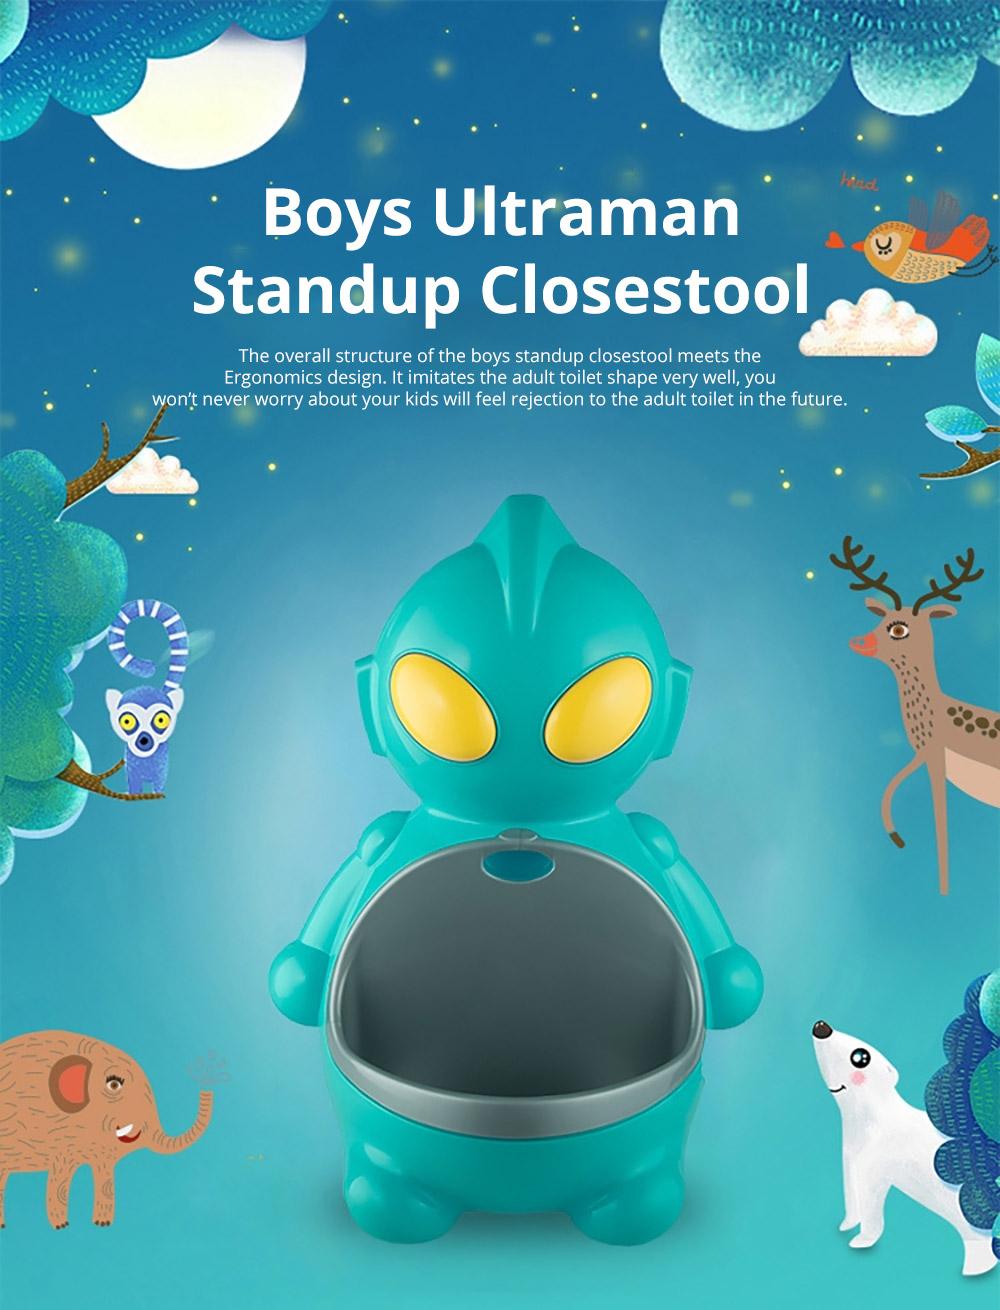 Unique Ultraman Toilet Trainer Boys Toilet Triaining Standup Potty Boys Mini Standup Closestool Potty Training 5